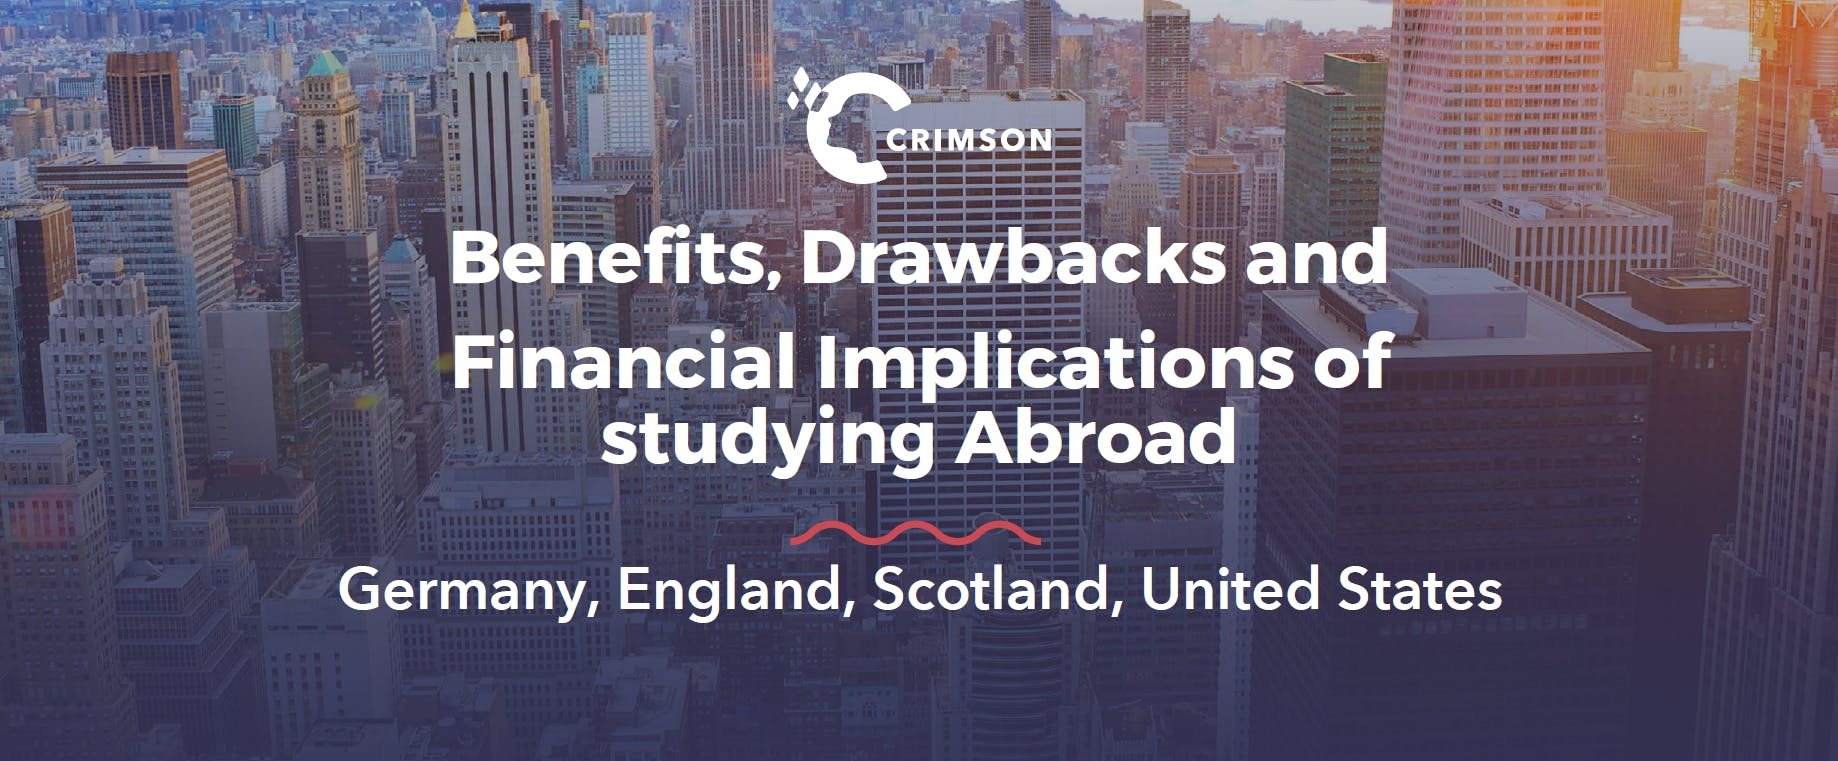 BENEFITS, DRAWBACKS AND FINANCIAL IMPLICATION